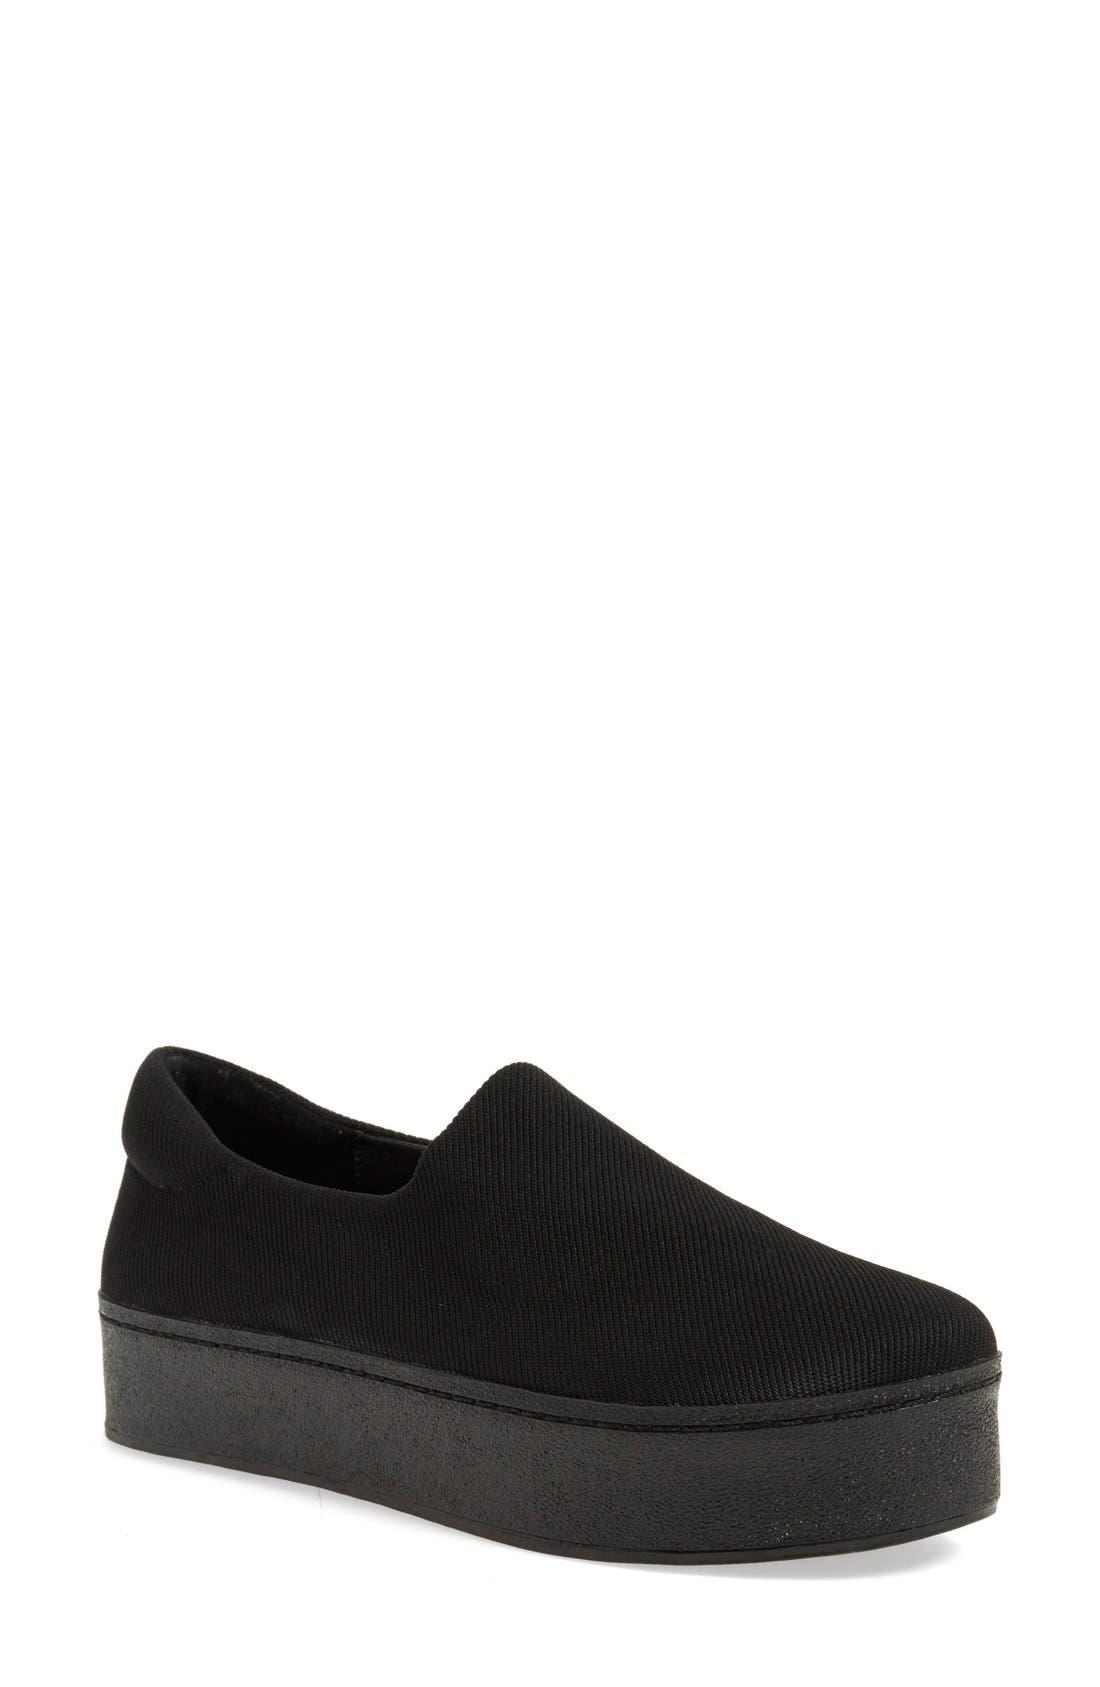 Cici Platform Sneaker,                         Main,                         color, 001